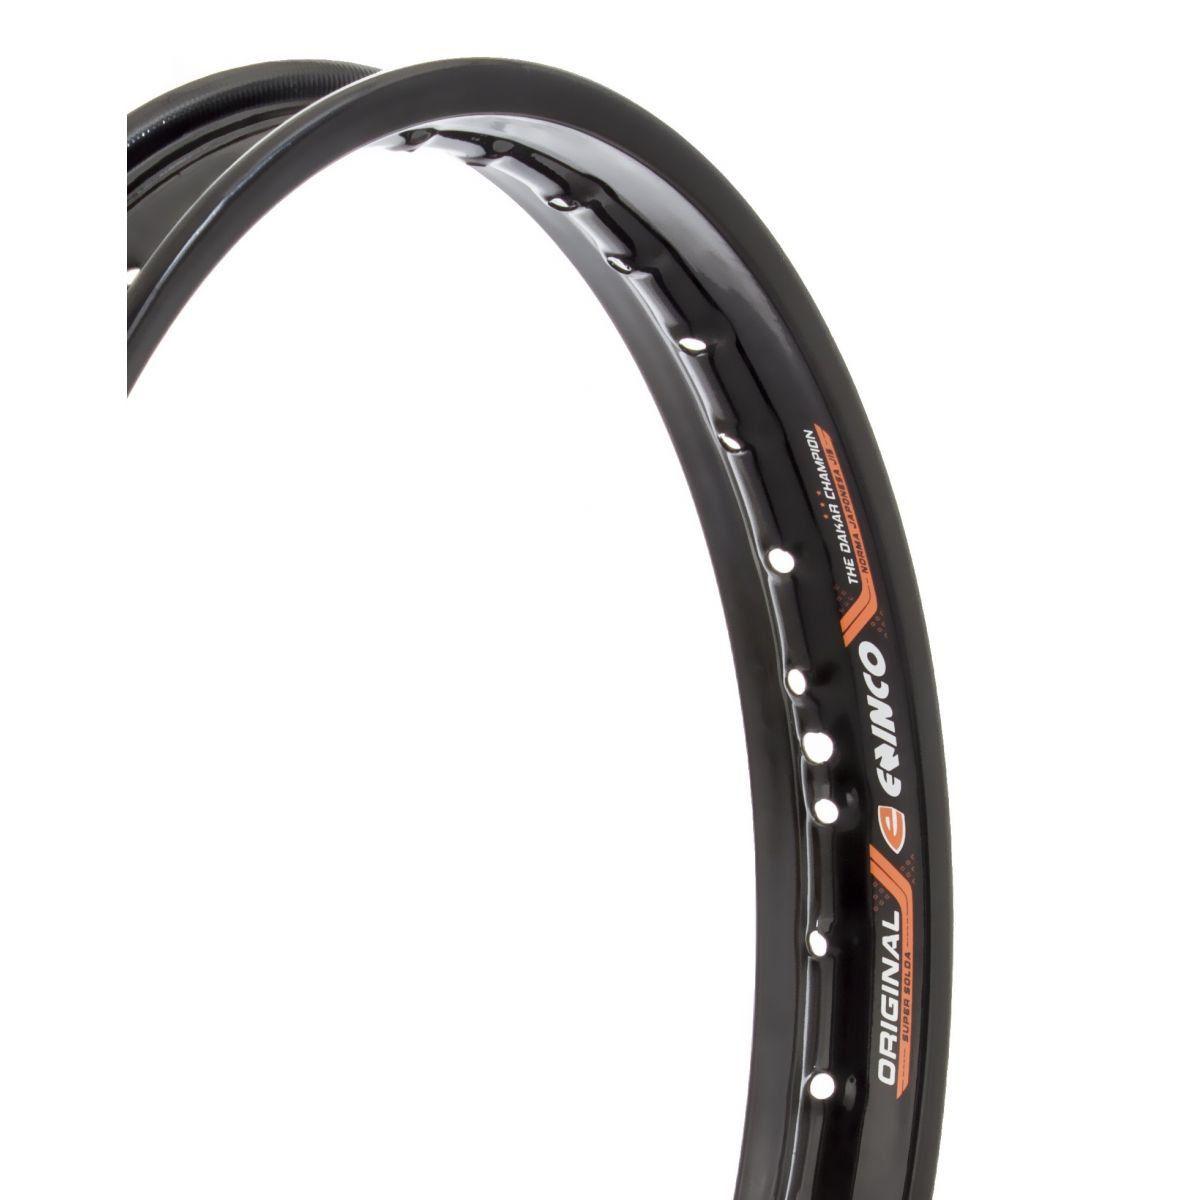 Aro de Moto Traseiro Yamaha Agrale / DT 180 / DT 200 - 1.85 X 18 - Preto - Eninco